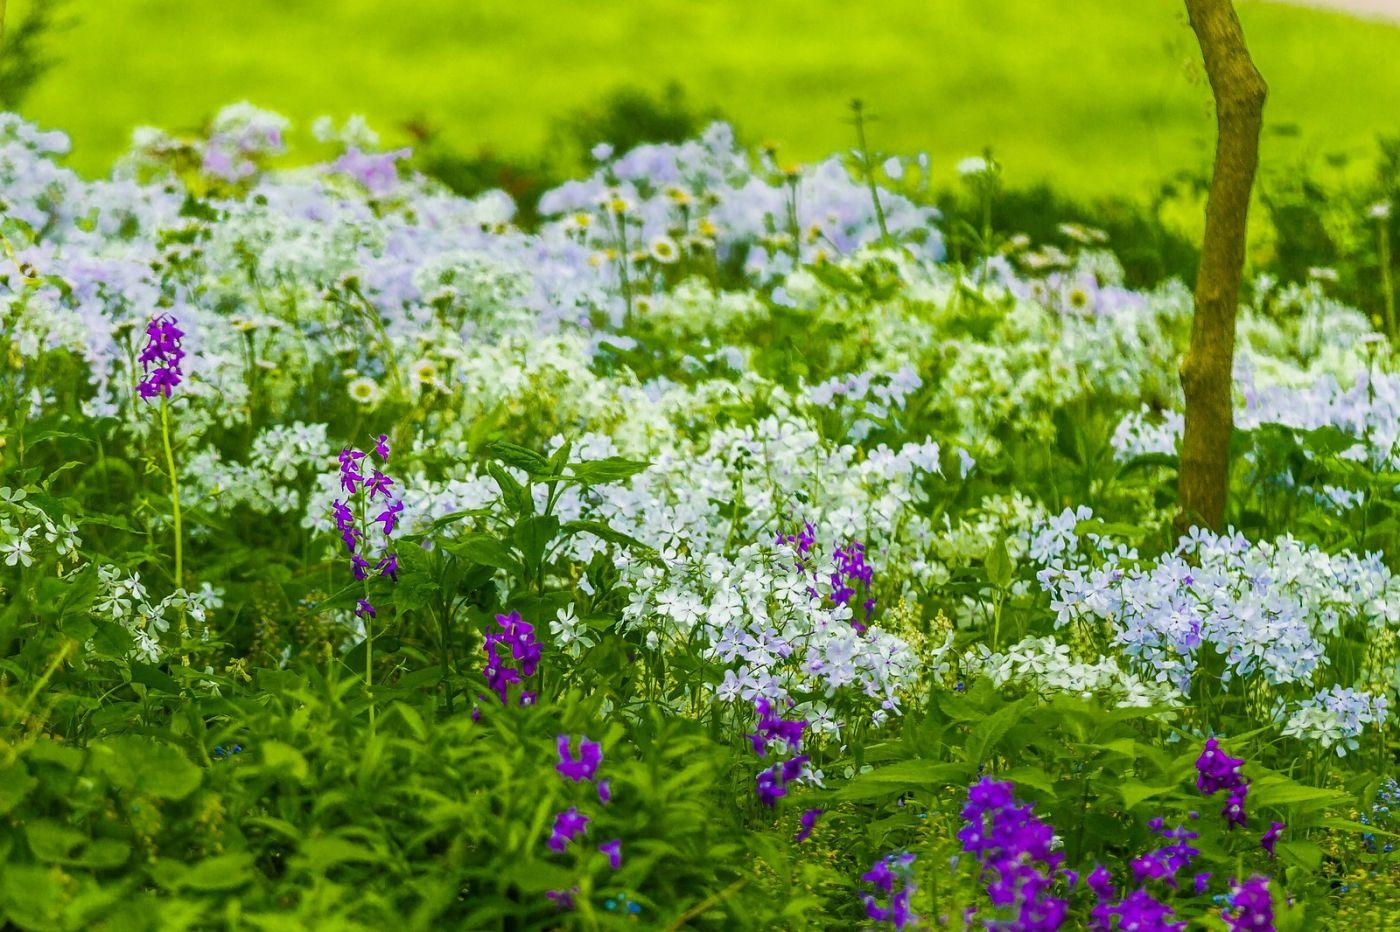 Chanticleer花园,有梦想的季节_图1-7